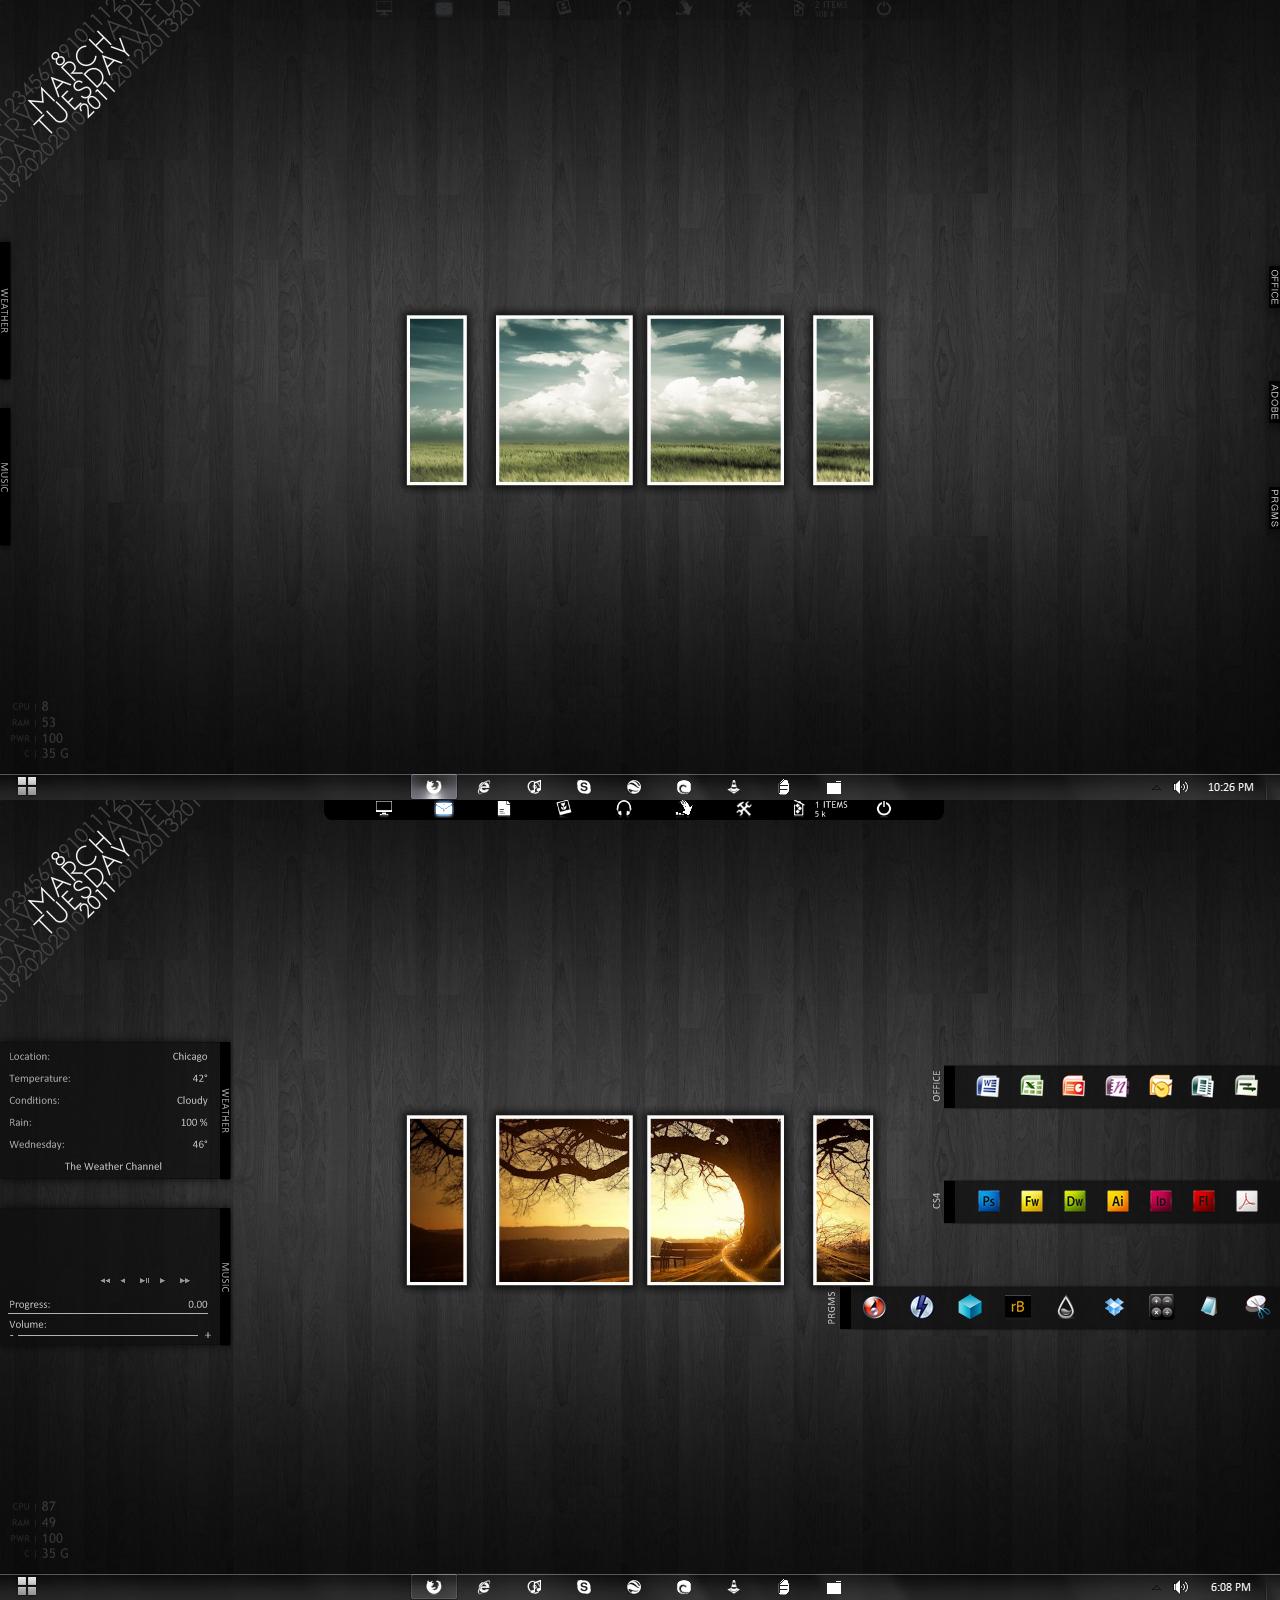 My first minimalist desktop by 007bp